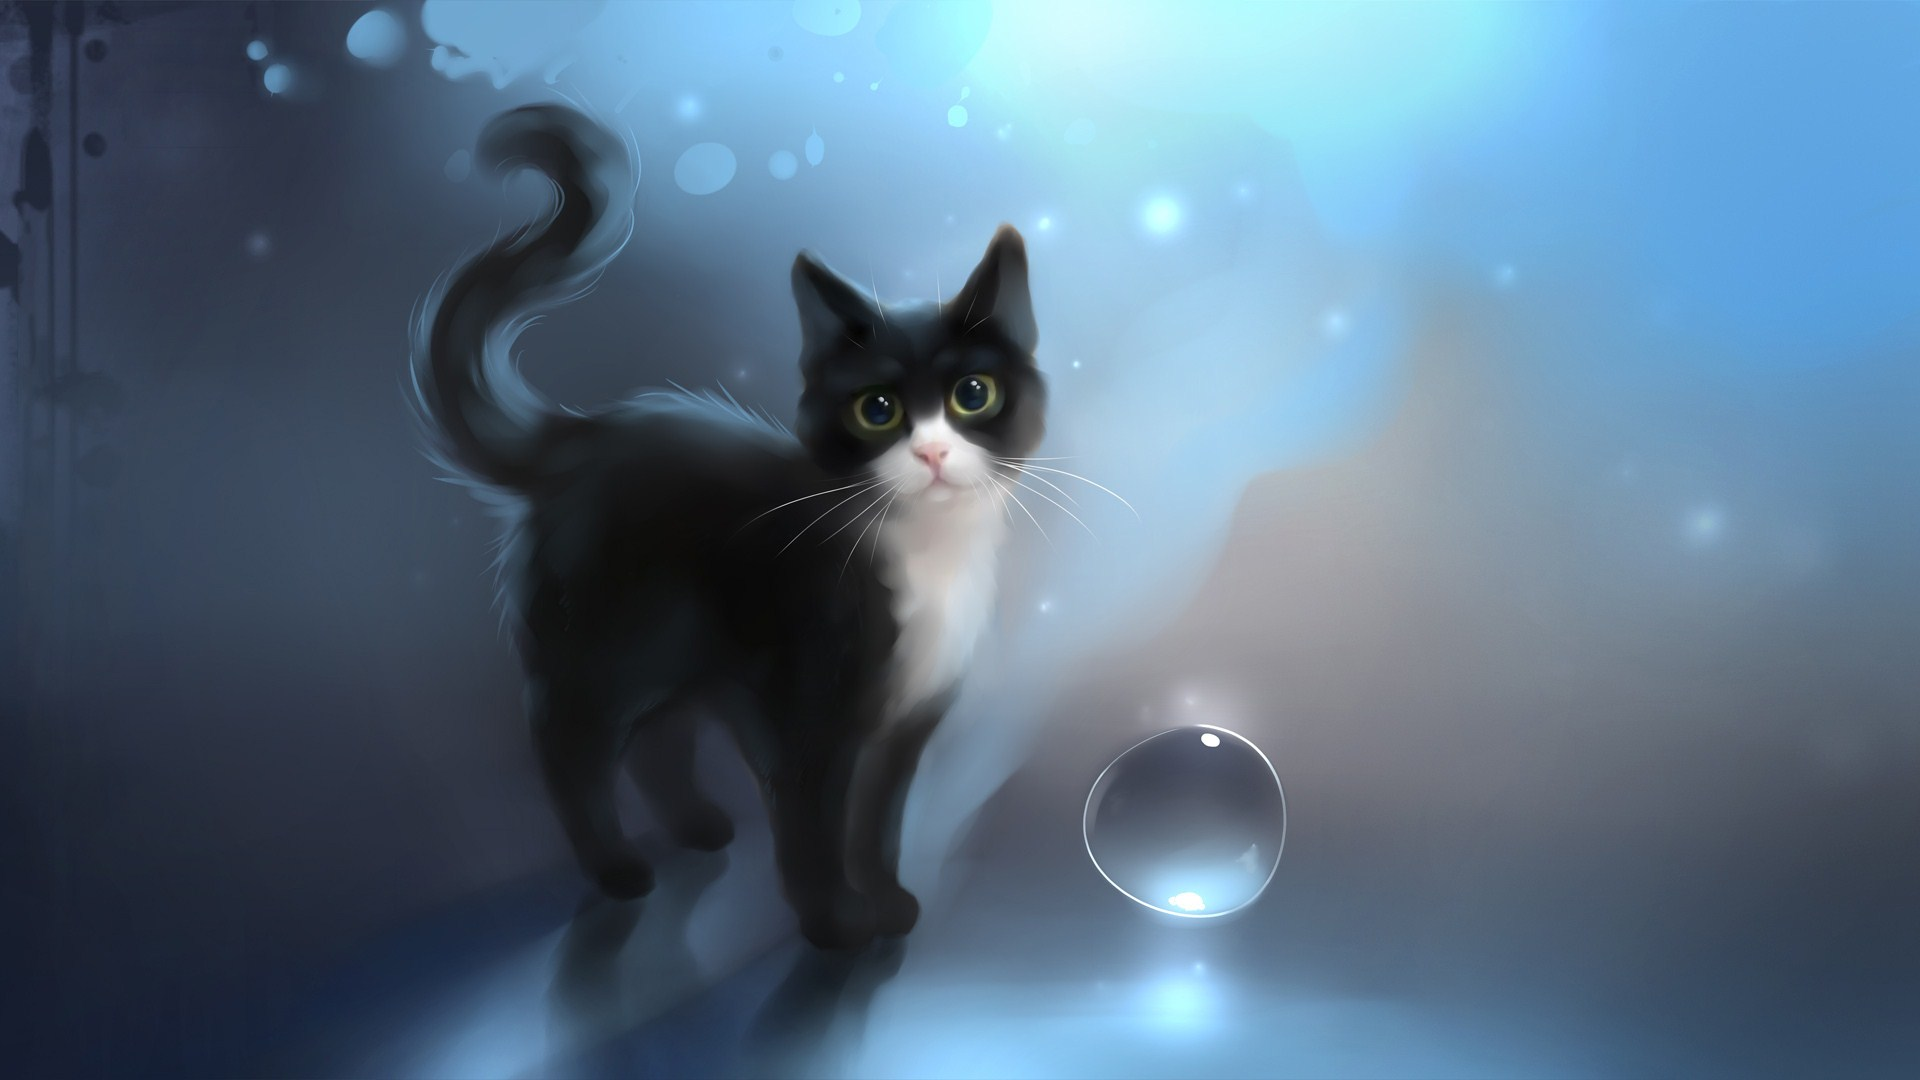 Grinning Black Cat